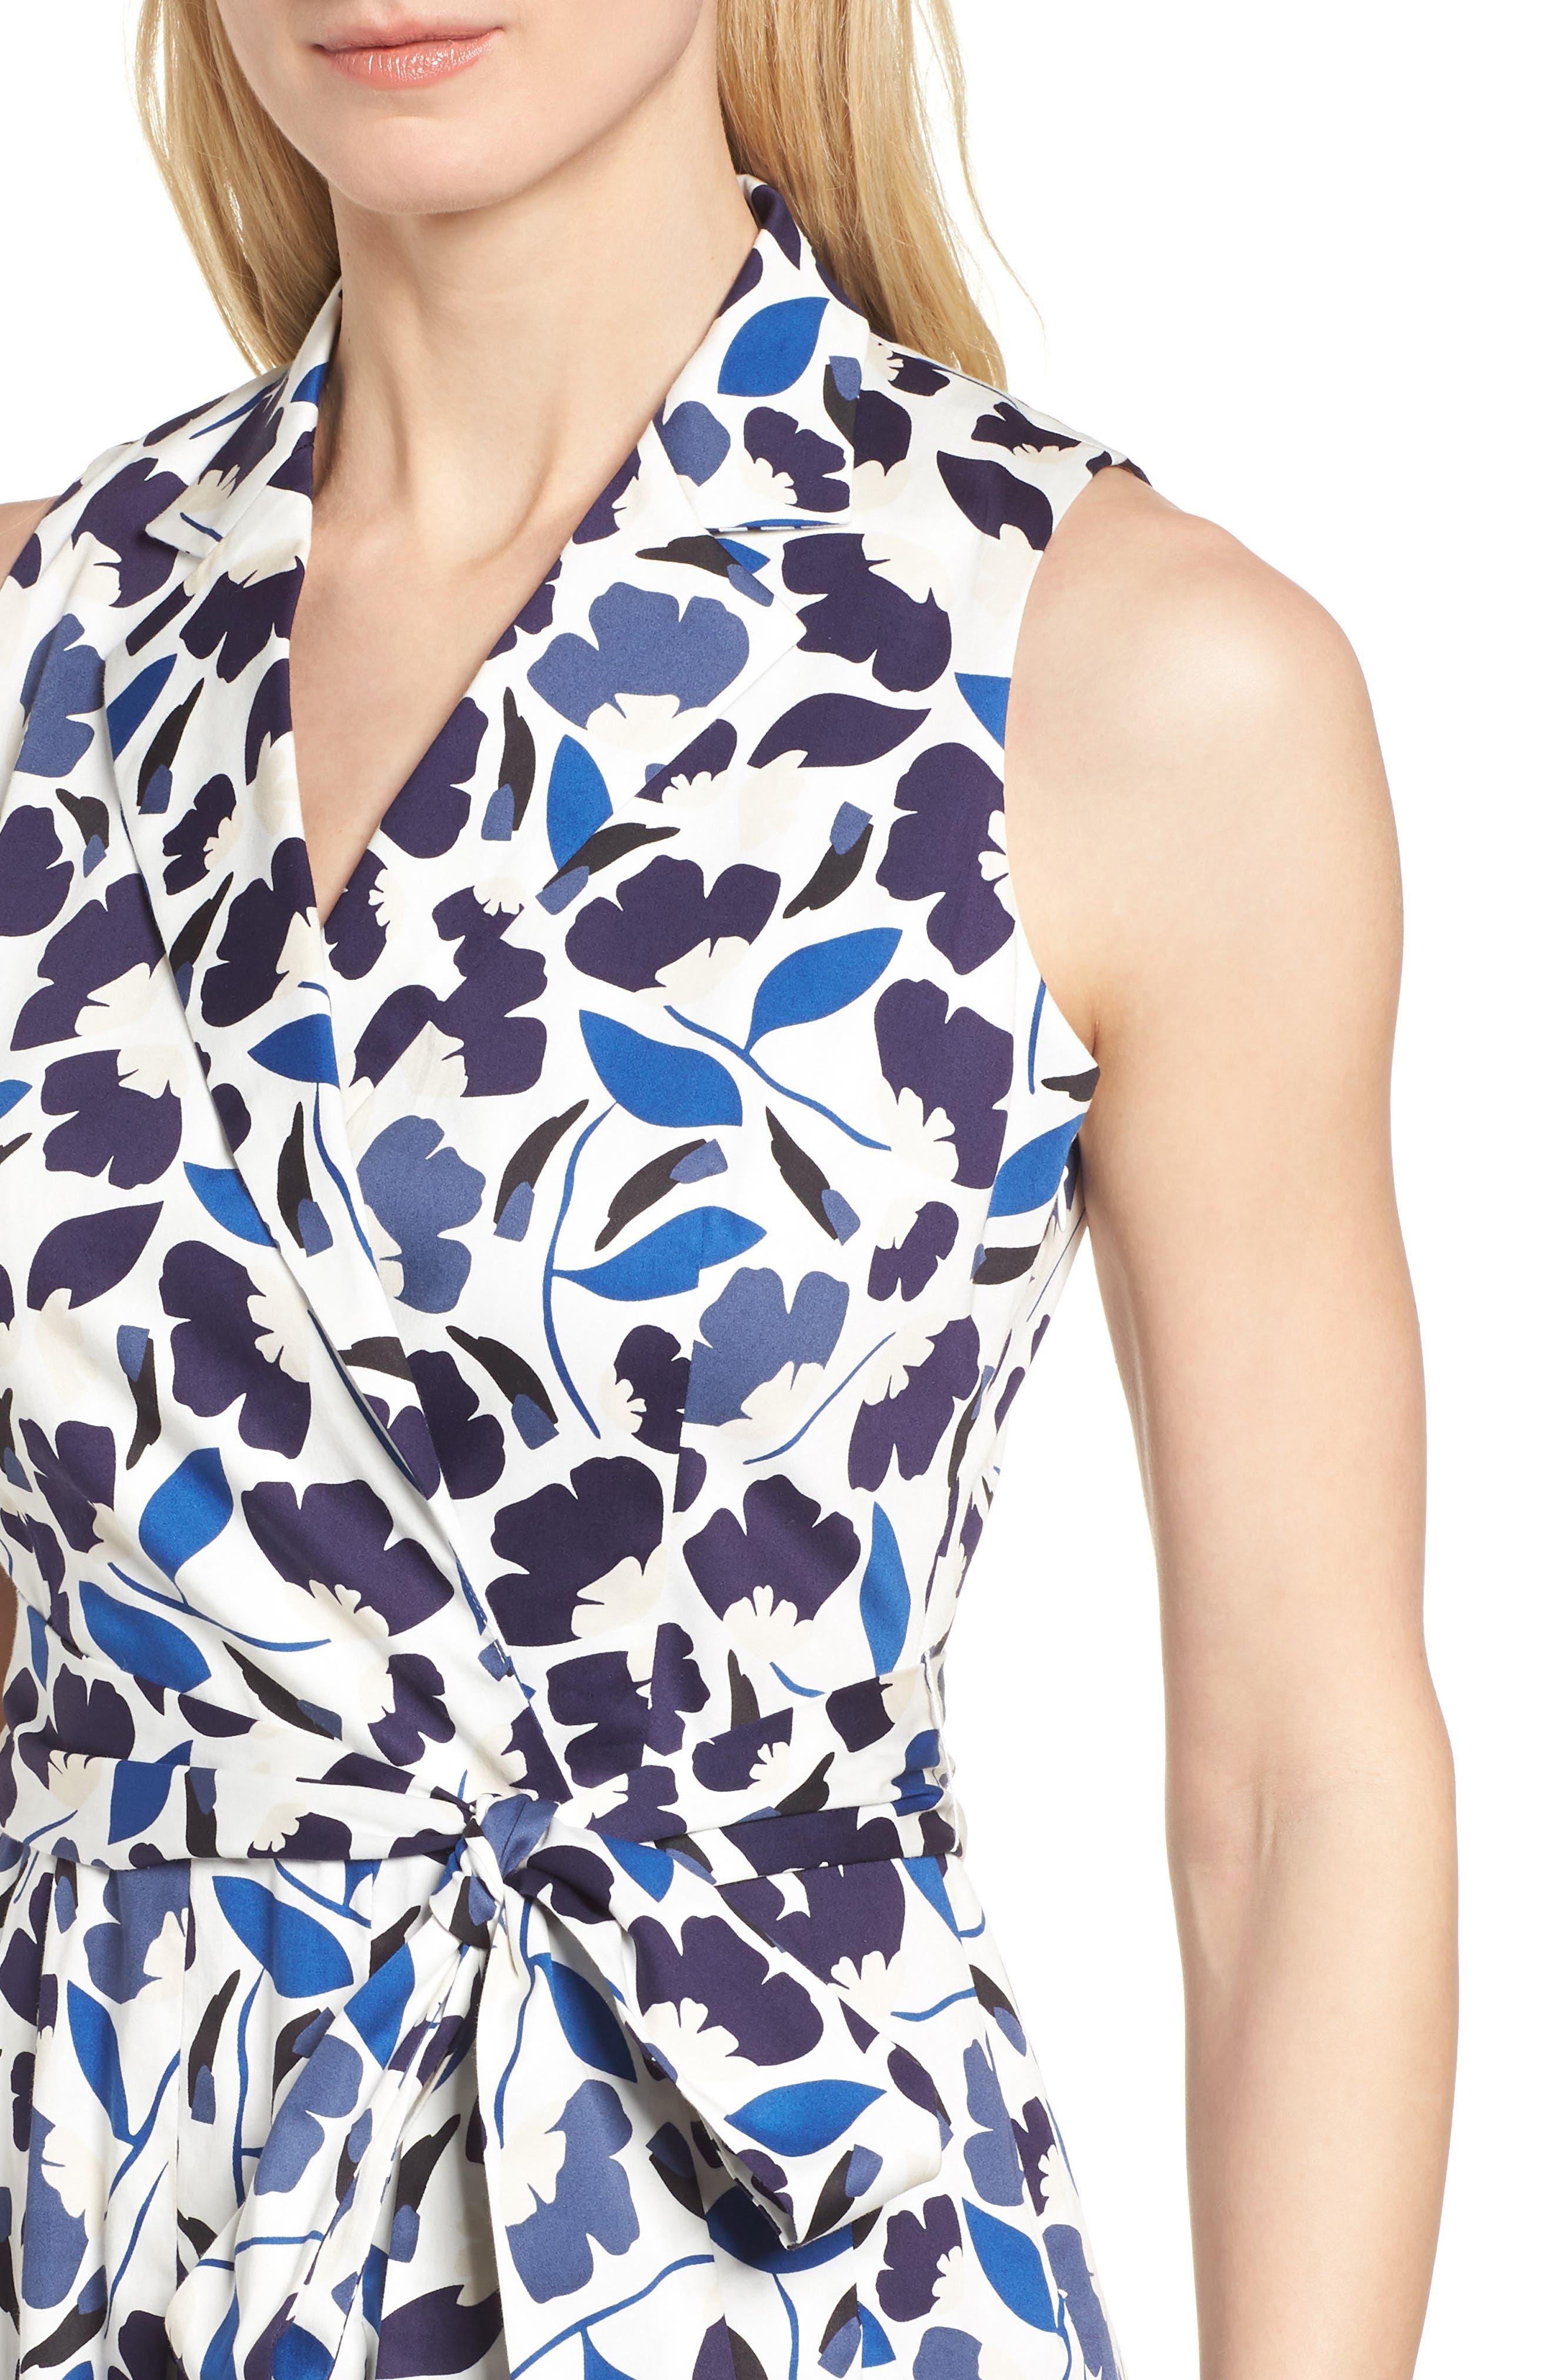 Humboldt Cotton Sateen Dress,                             Alternate thumbnail 4, color,                             410